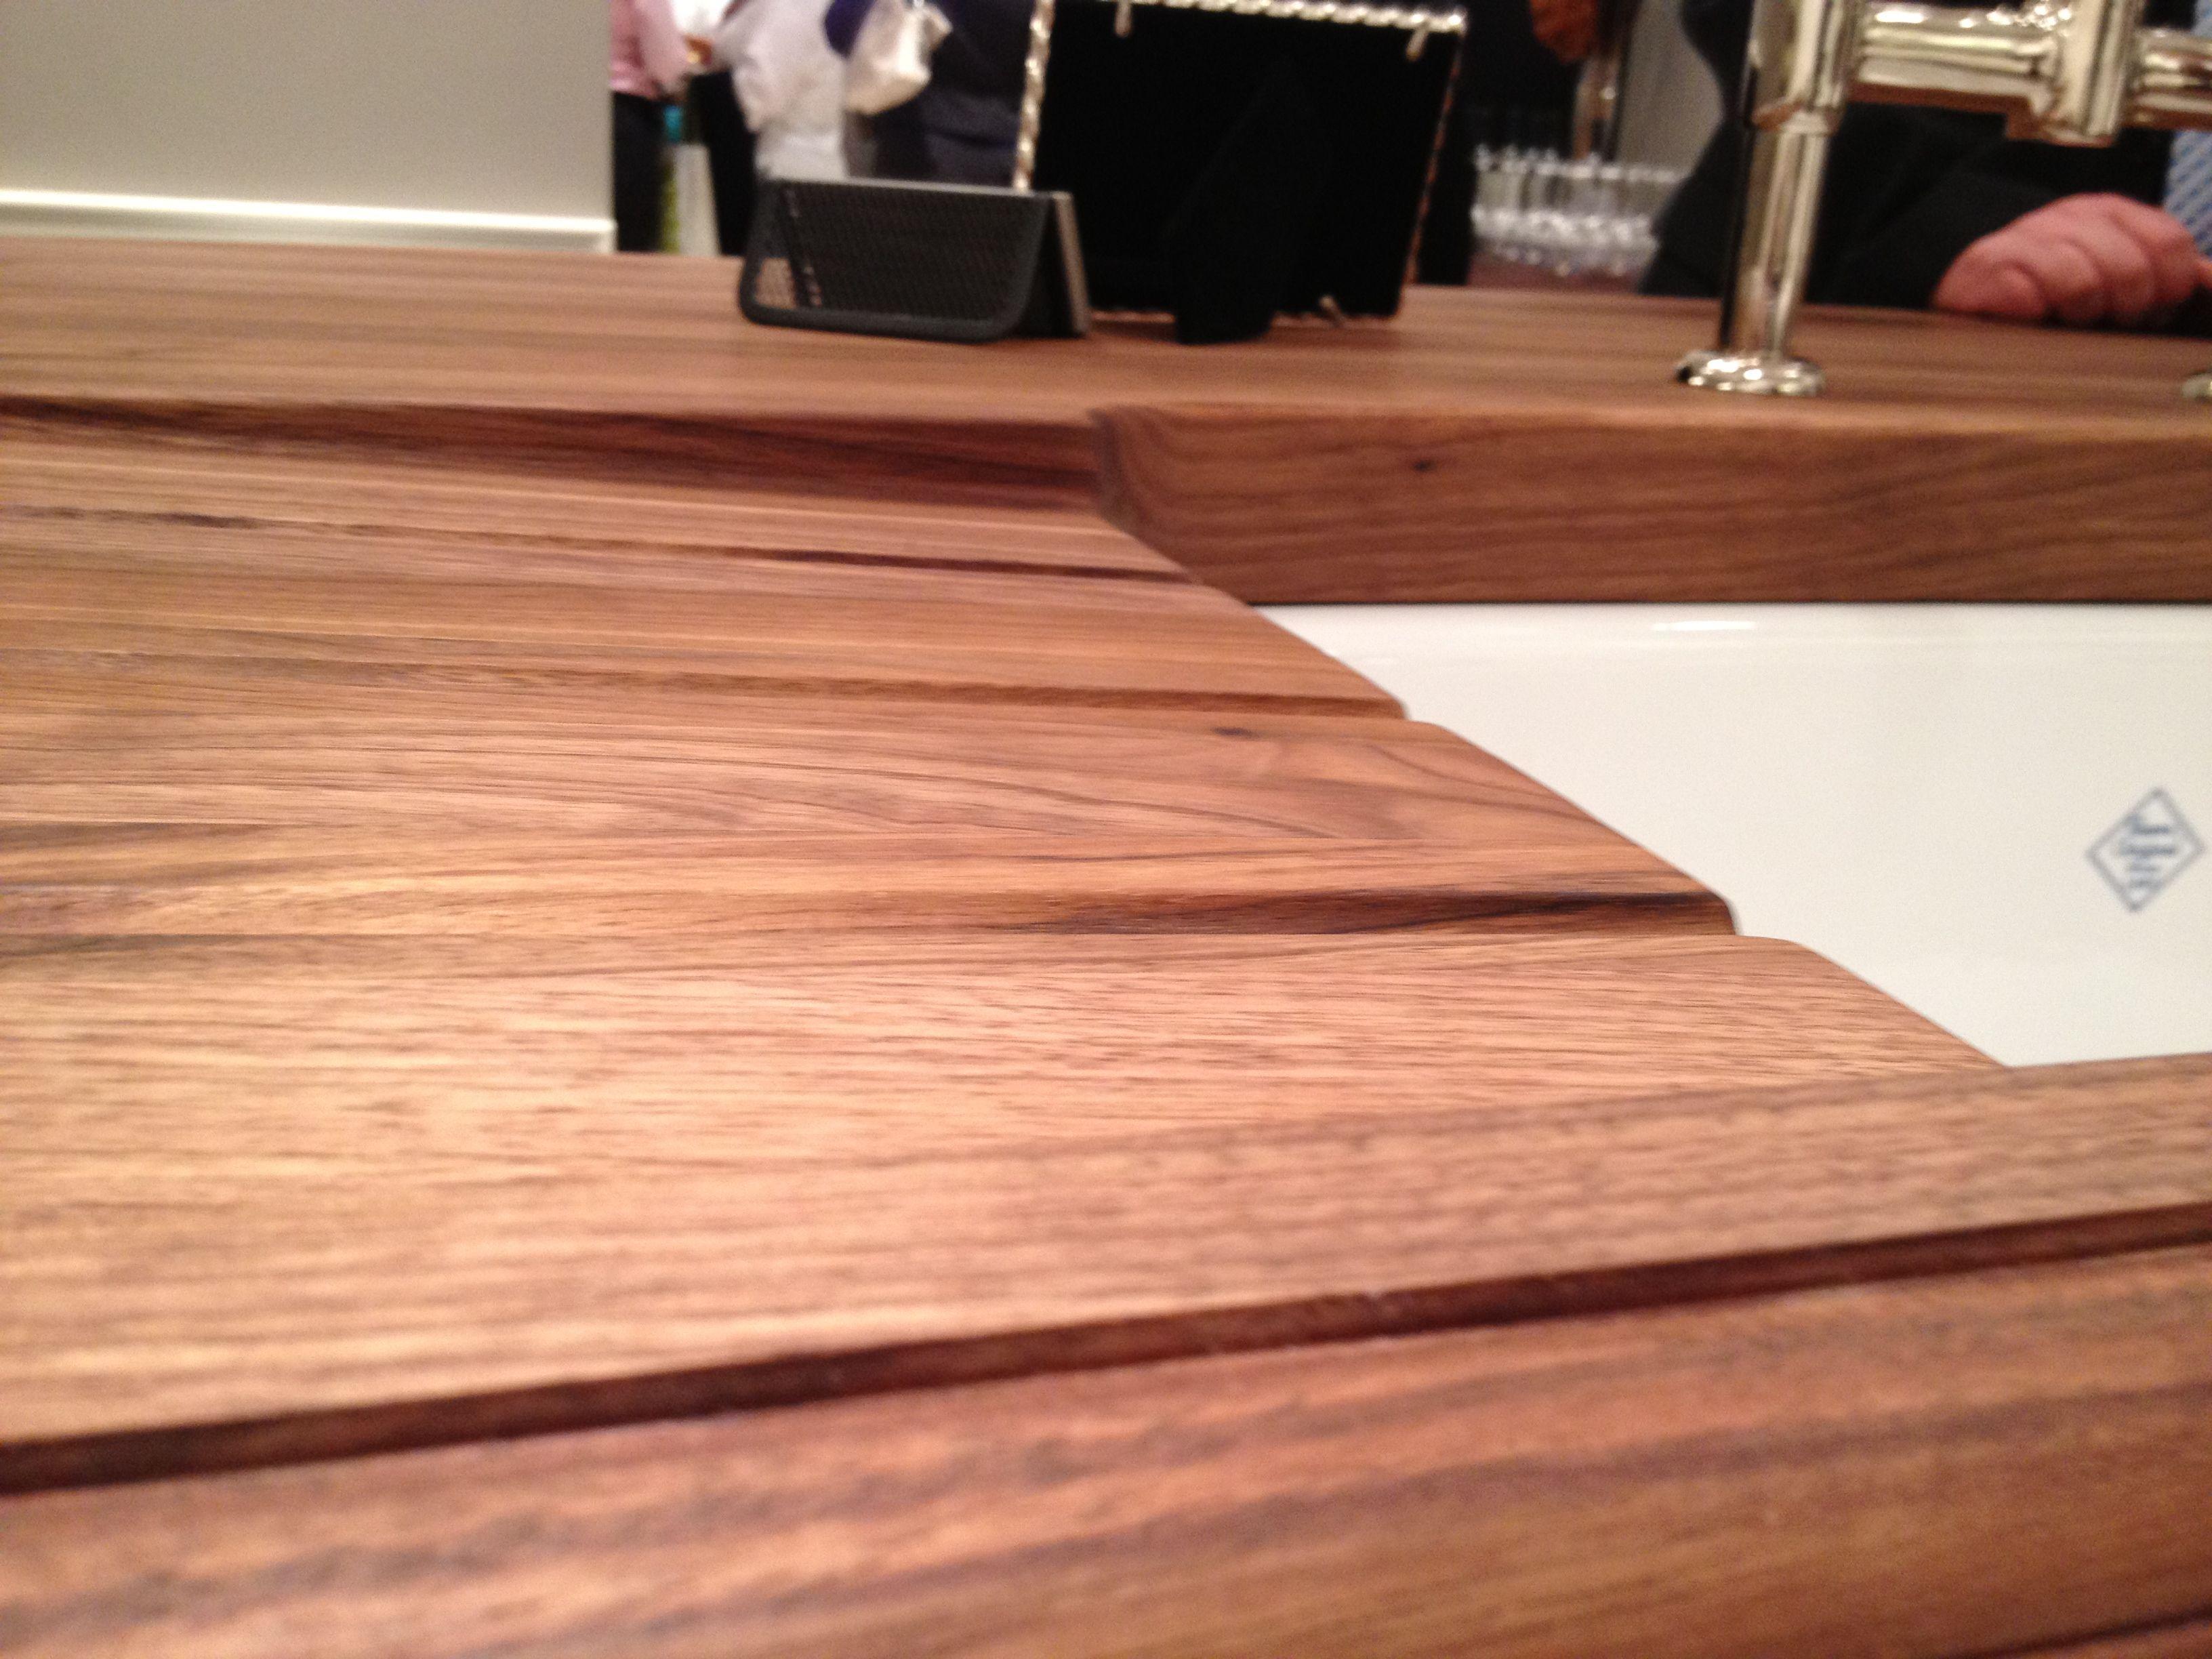 teak butcher block countertops wood countertops kitchen Top 25 Ideas About Butcher Block On Pinterest Countertops Wood